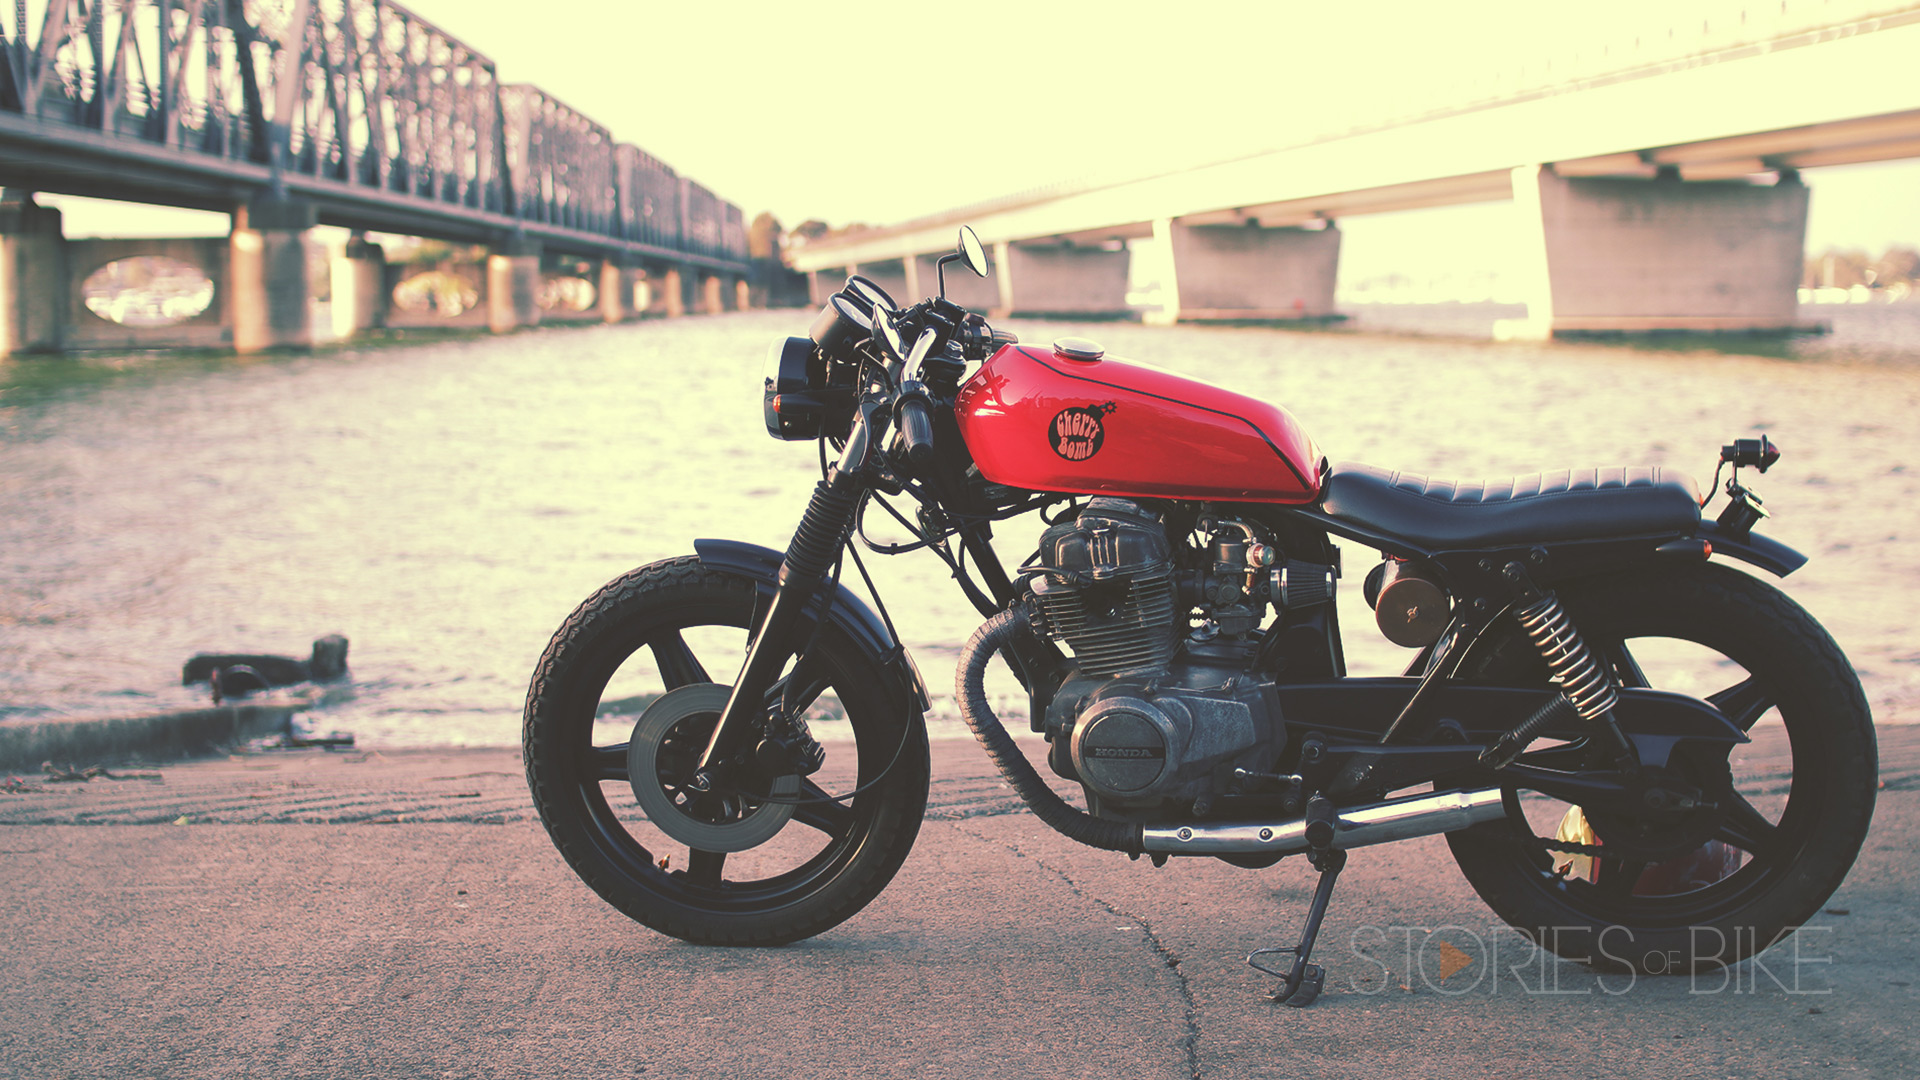 StoriesOfBike_Ep2_Bike_3.jpg